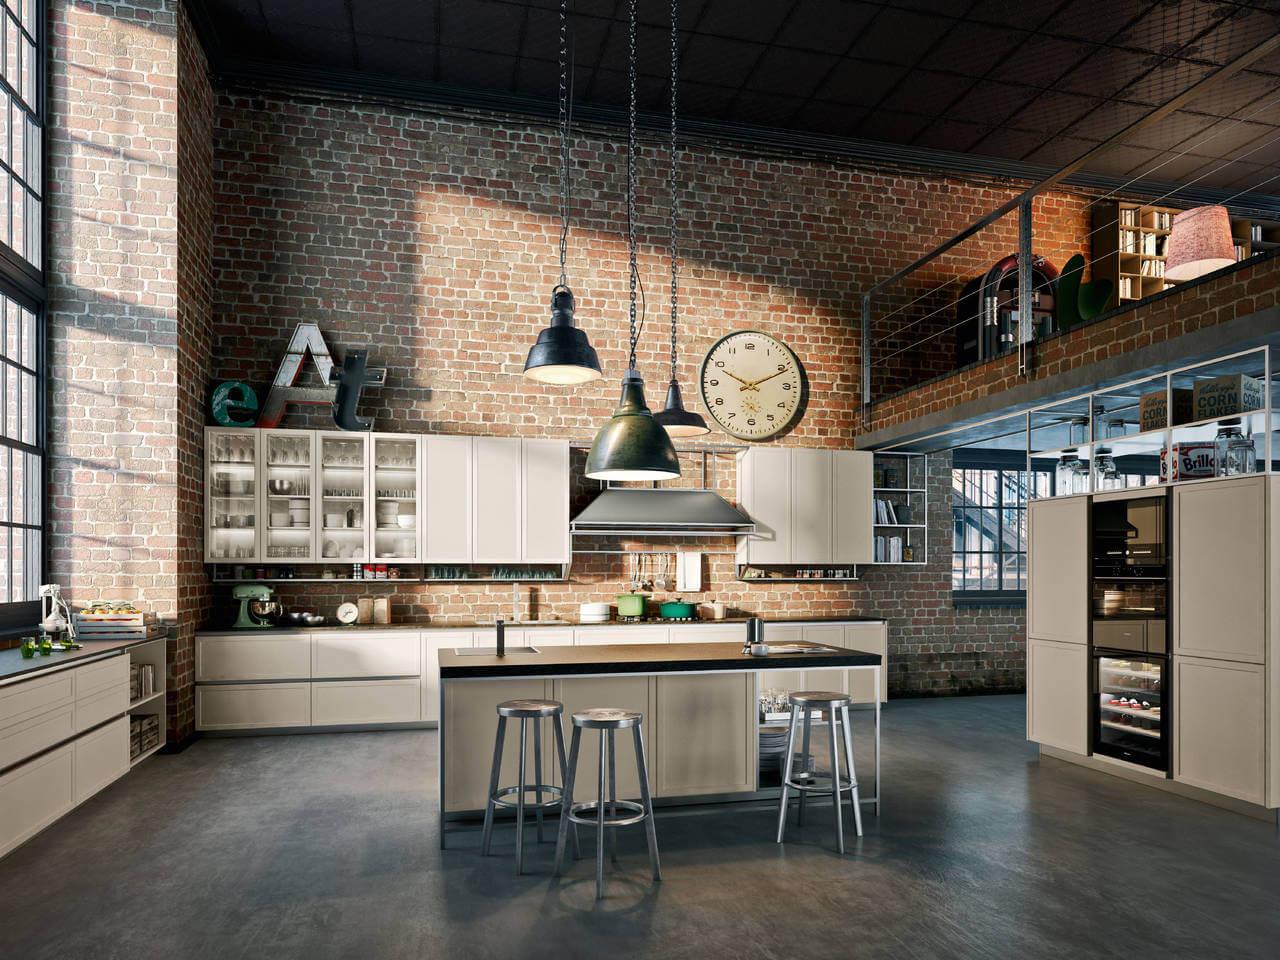 Keuken in industriële stijl